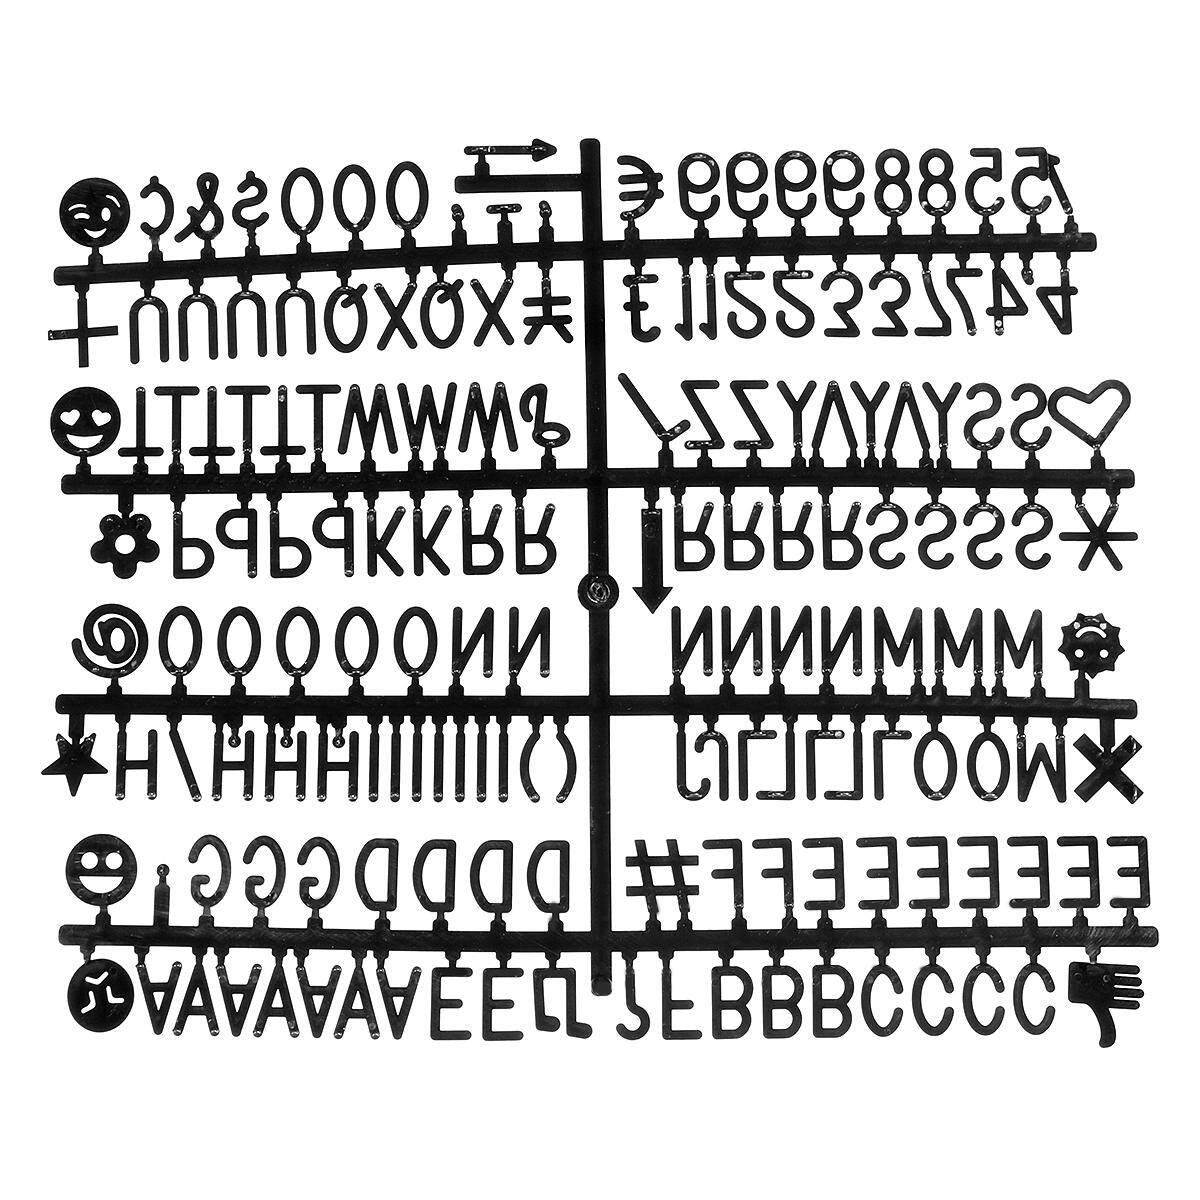 Rack Diy Letter Board Sign To Do List Reminder Memo Signage Felt Display Decor Pin By Moonbeam.